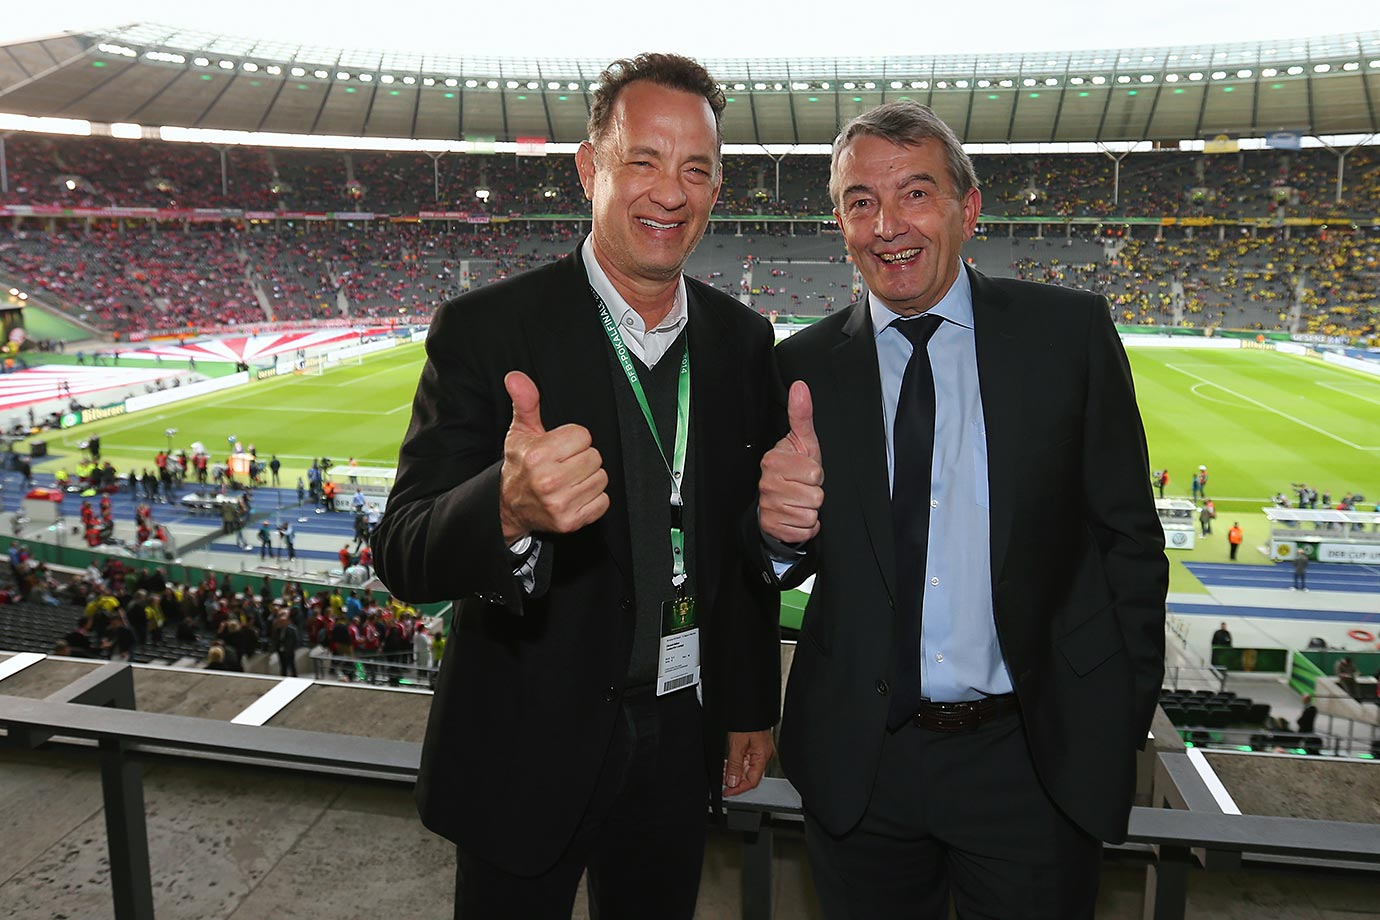 May 17, 2014: Borussia Dortmund vs. FC Bayern Muenchen